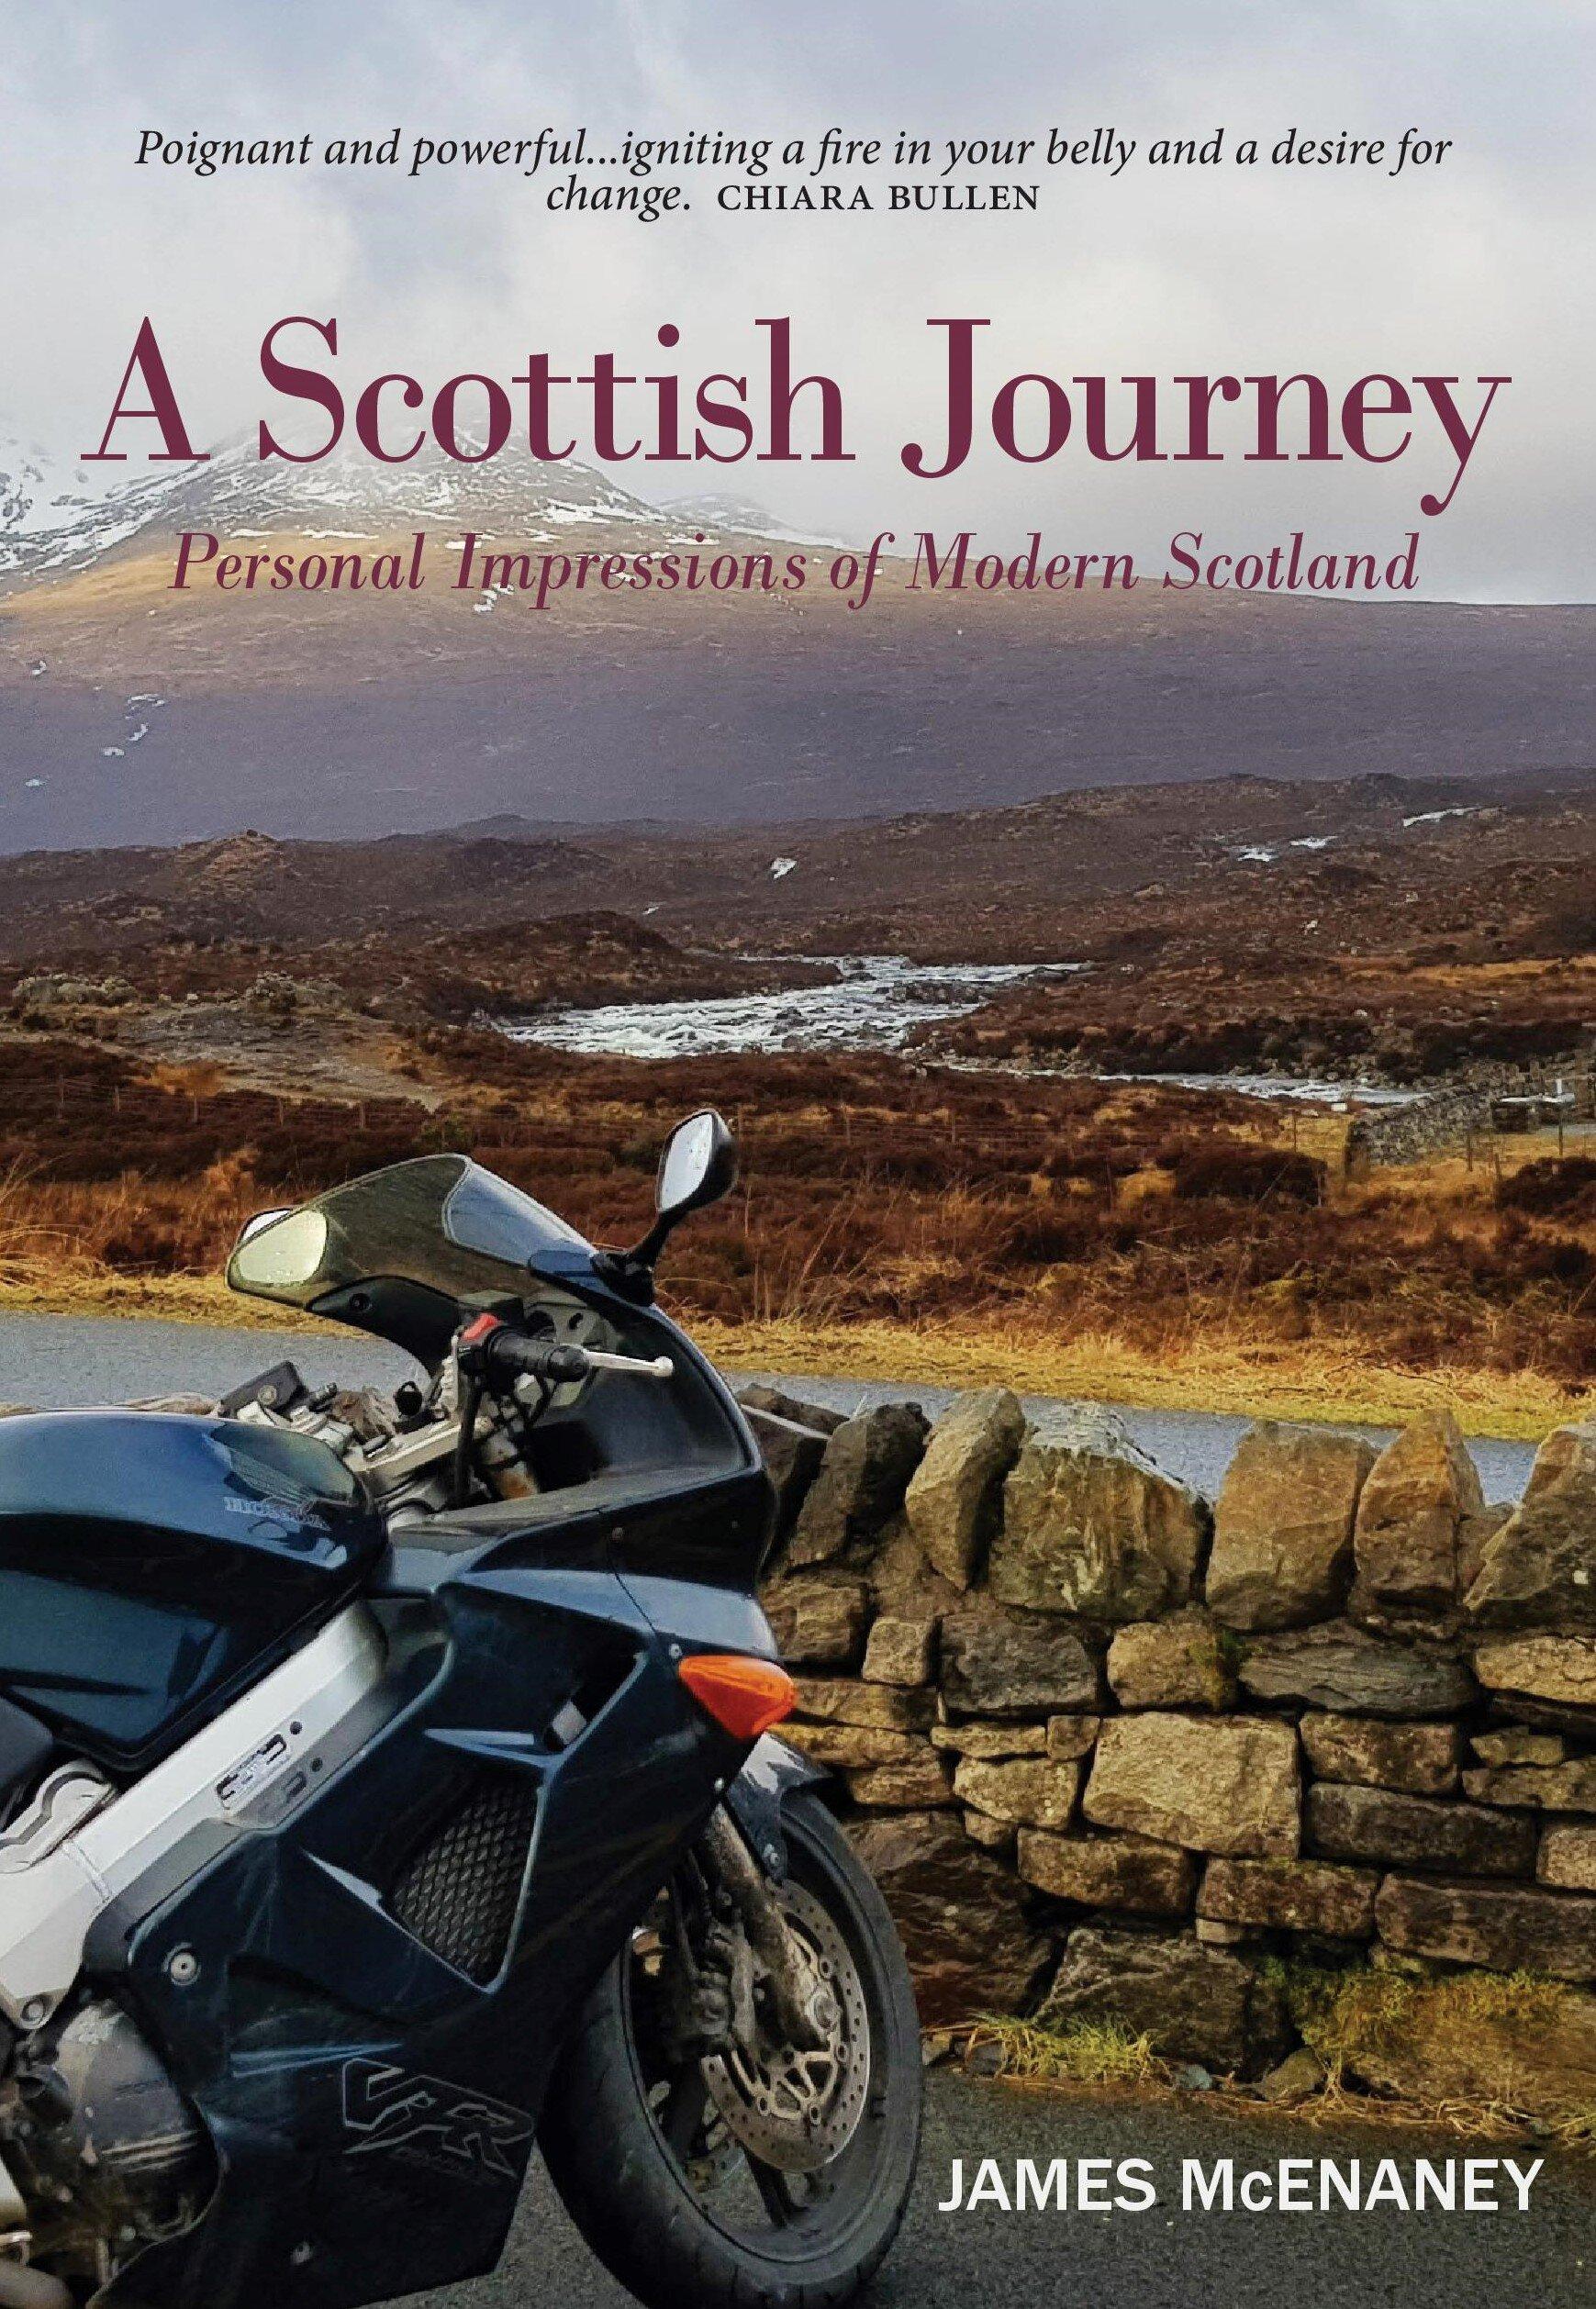 A Scottish Journey James McEnaney 9781912147427 Luath Press.jpg